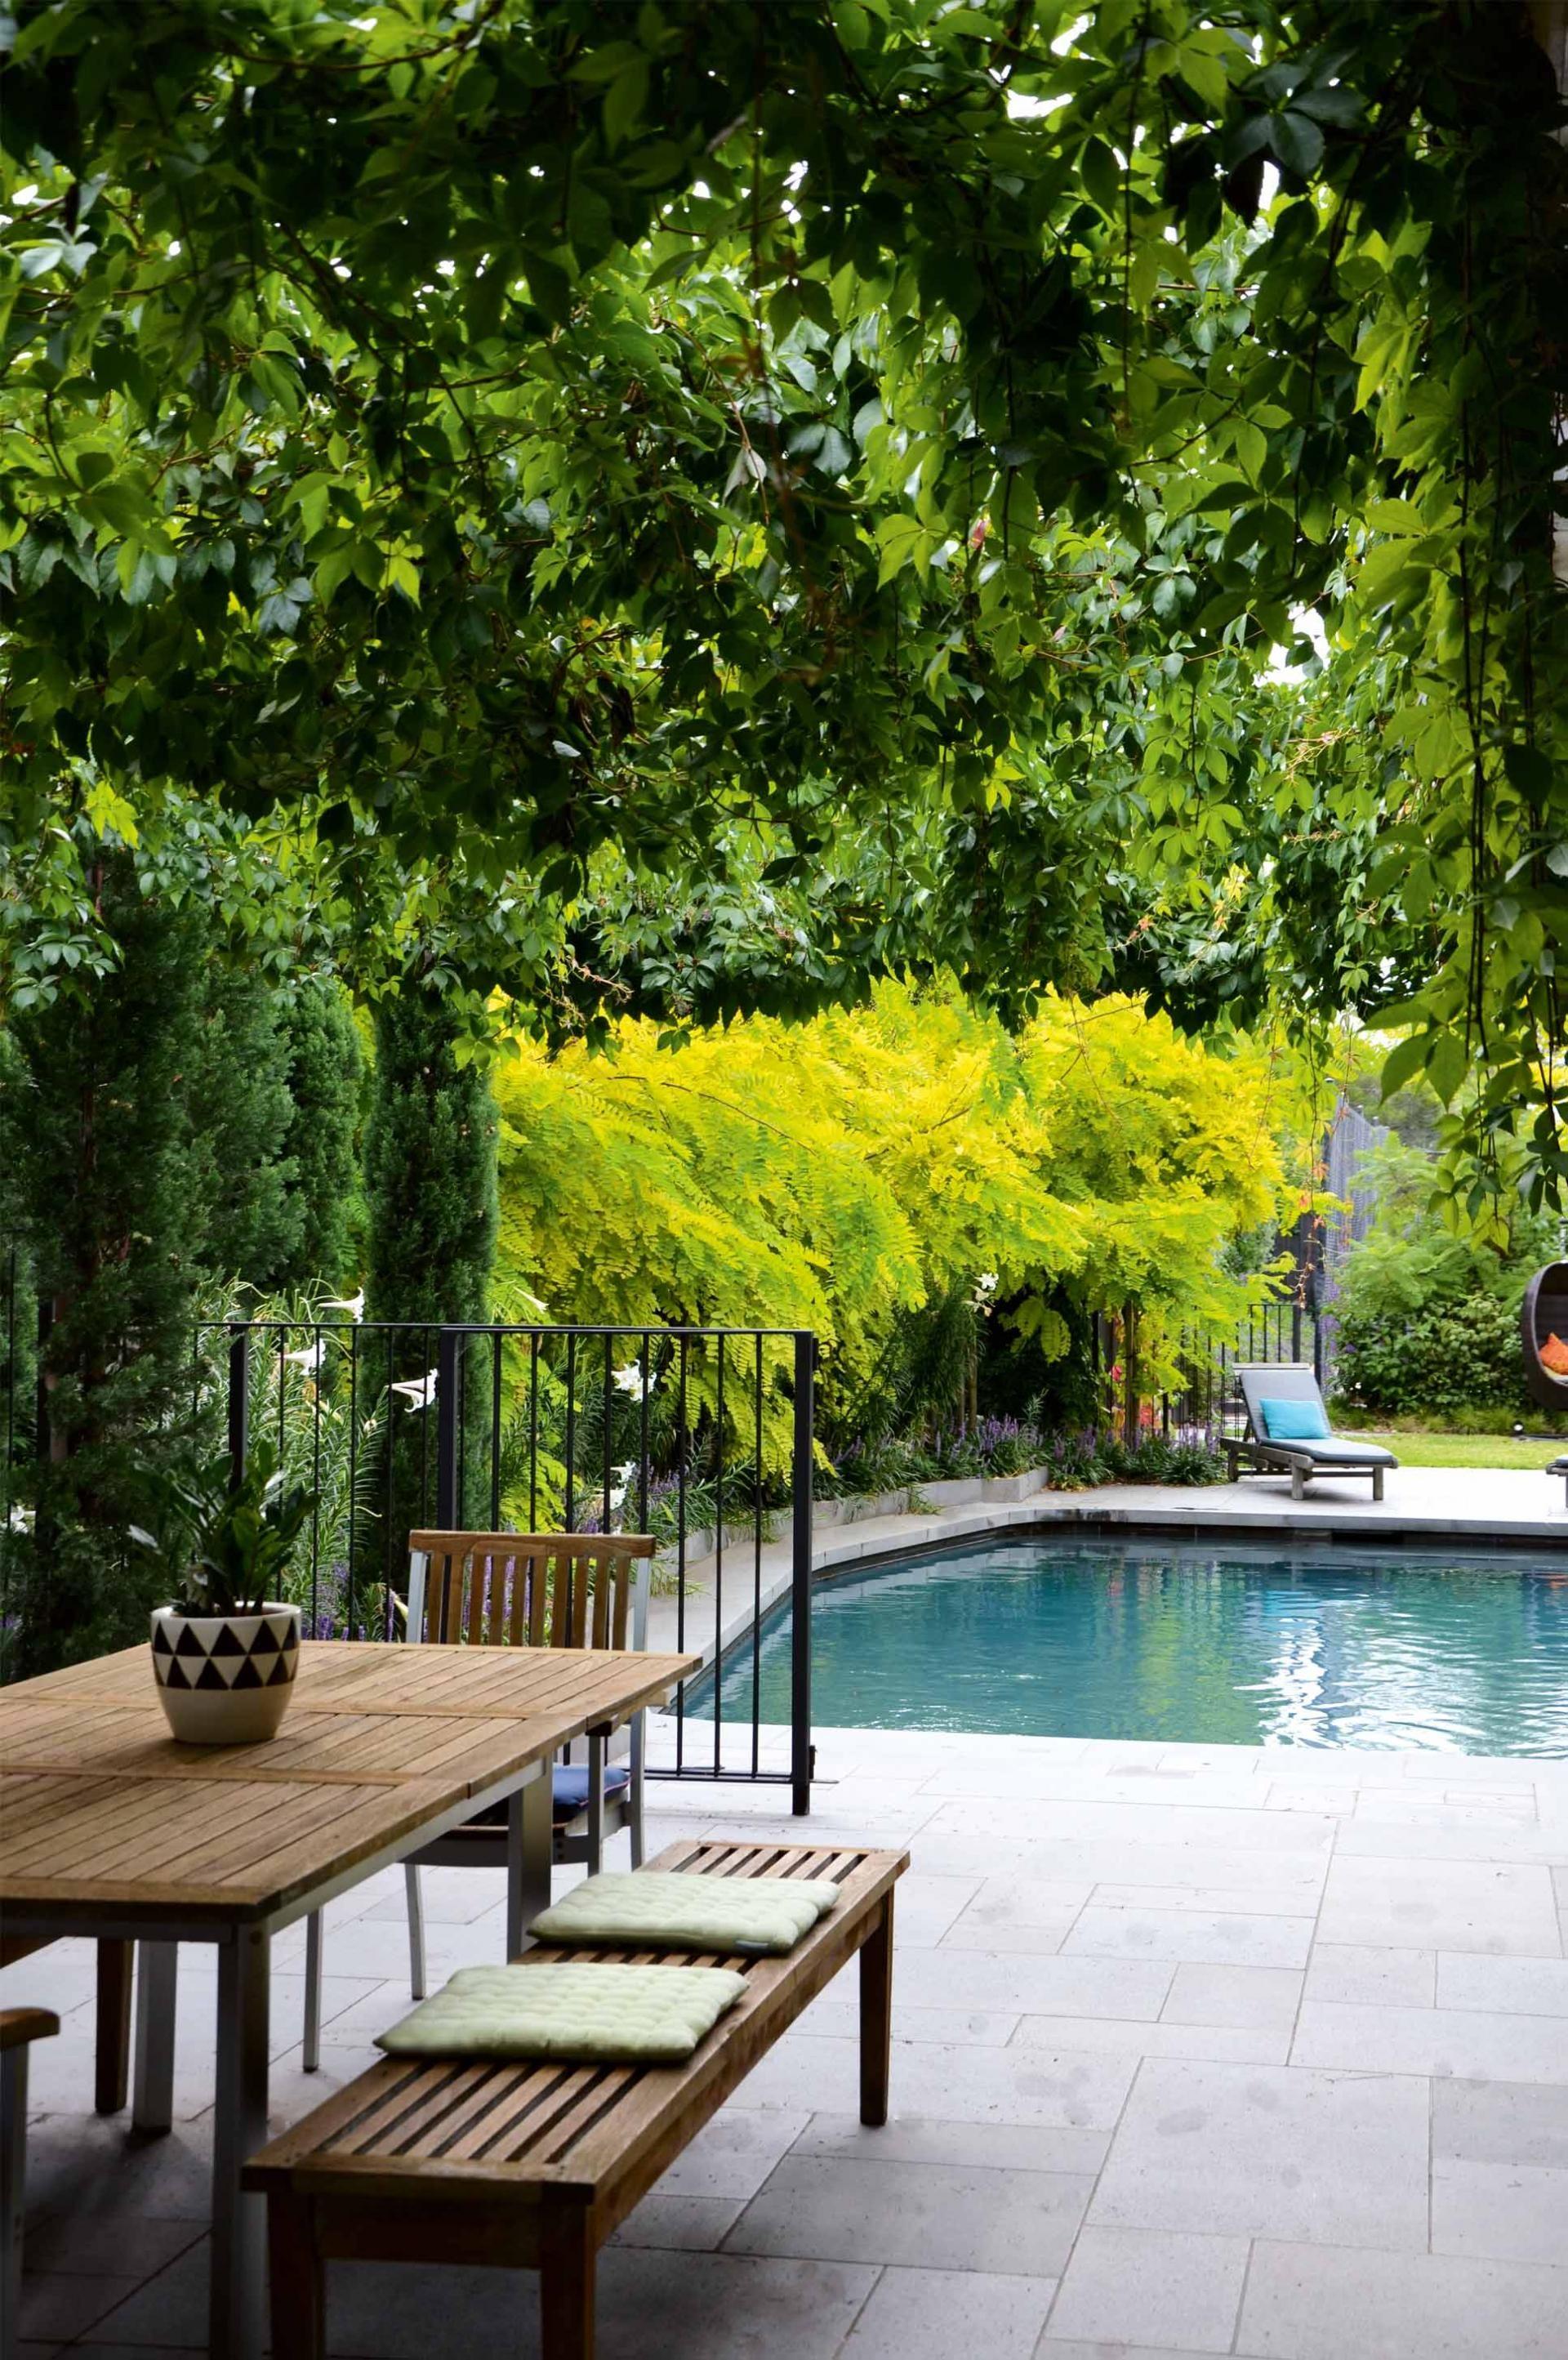 A tranquil garden design in the inner city graphy by Priya